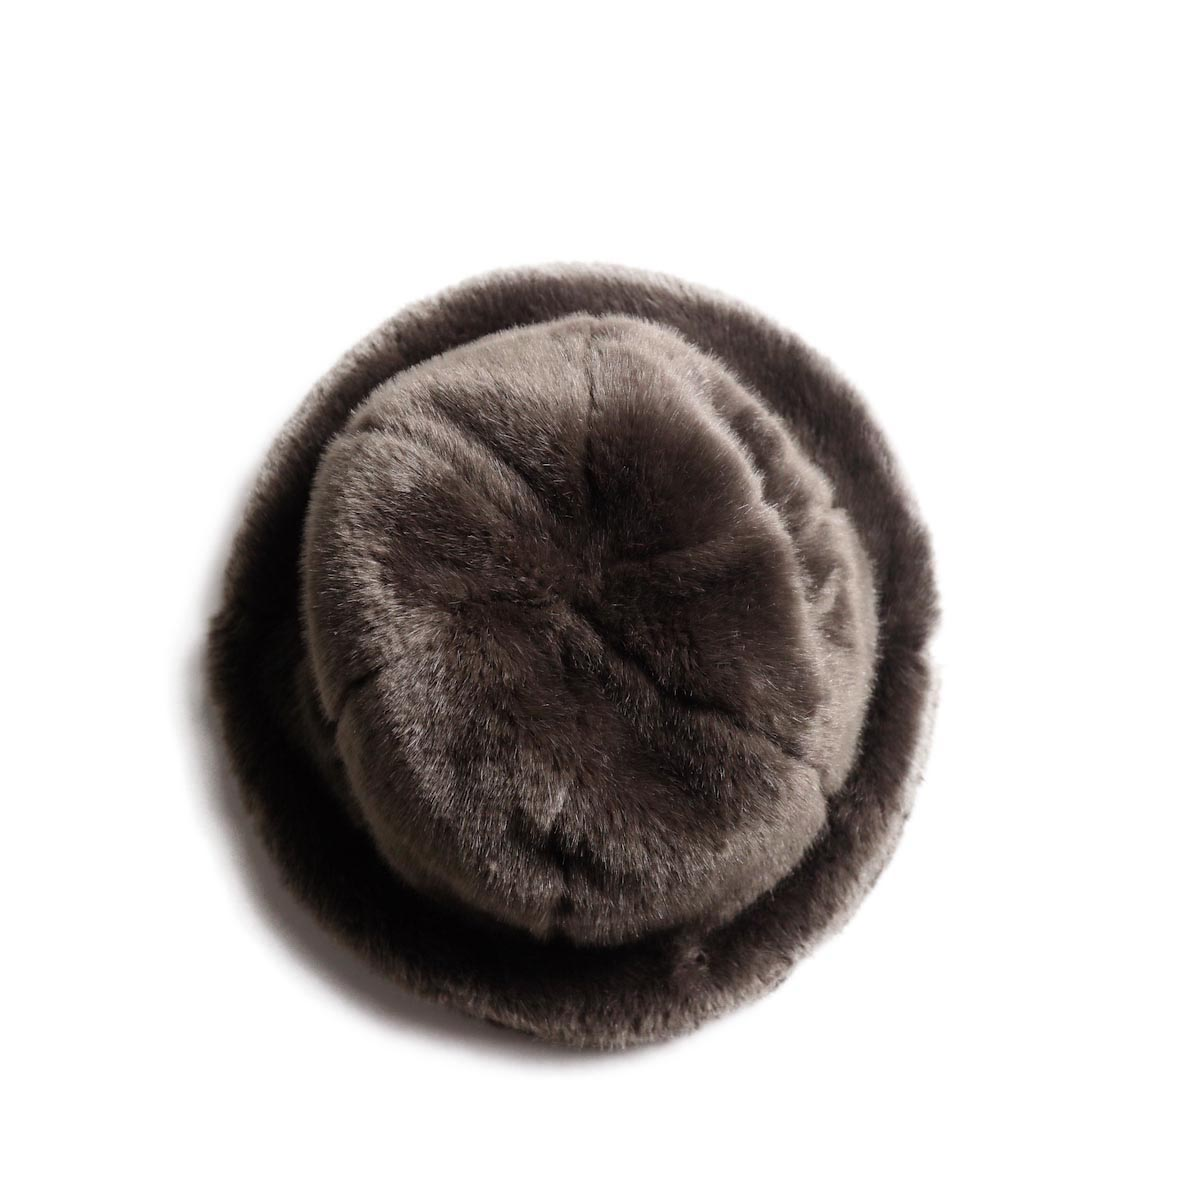 KIJIMA TAKAYUKI / Fake Fur 6 Panel Hat (No.182926) brown 上